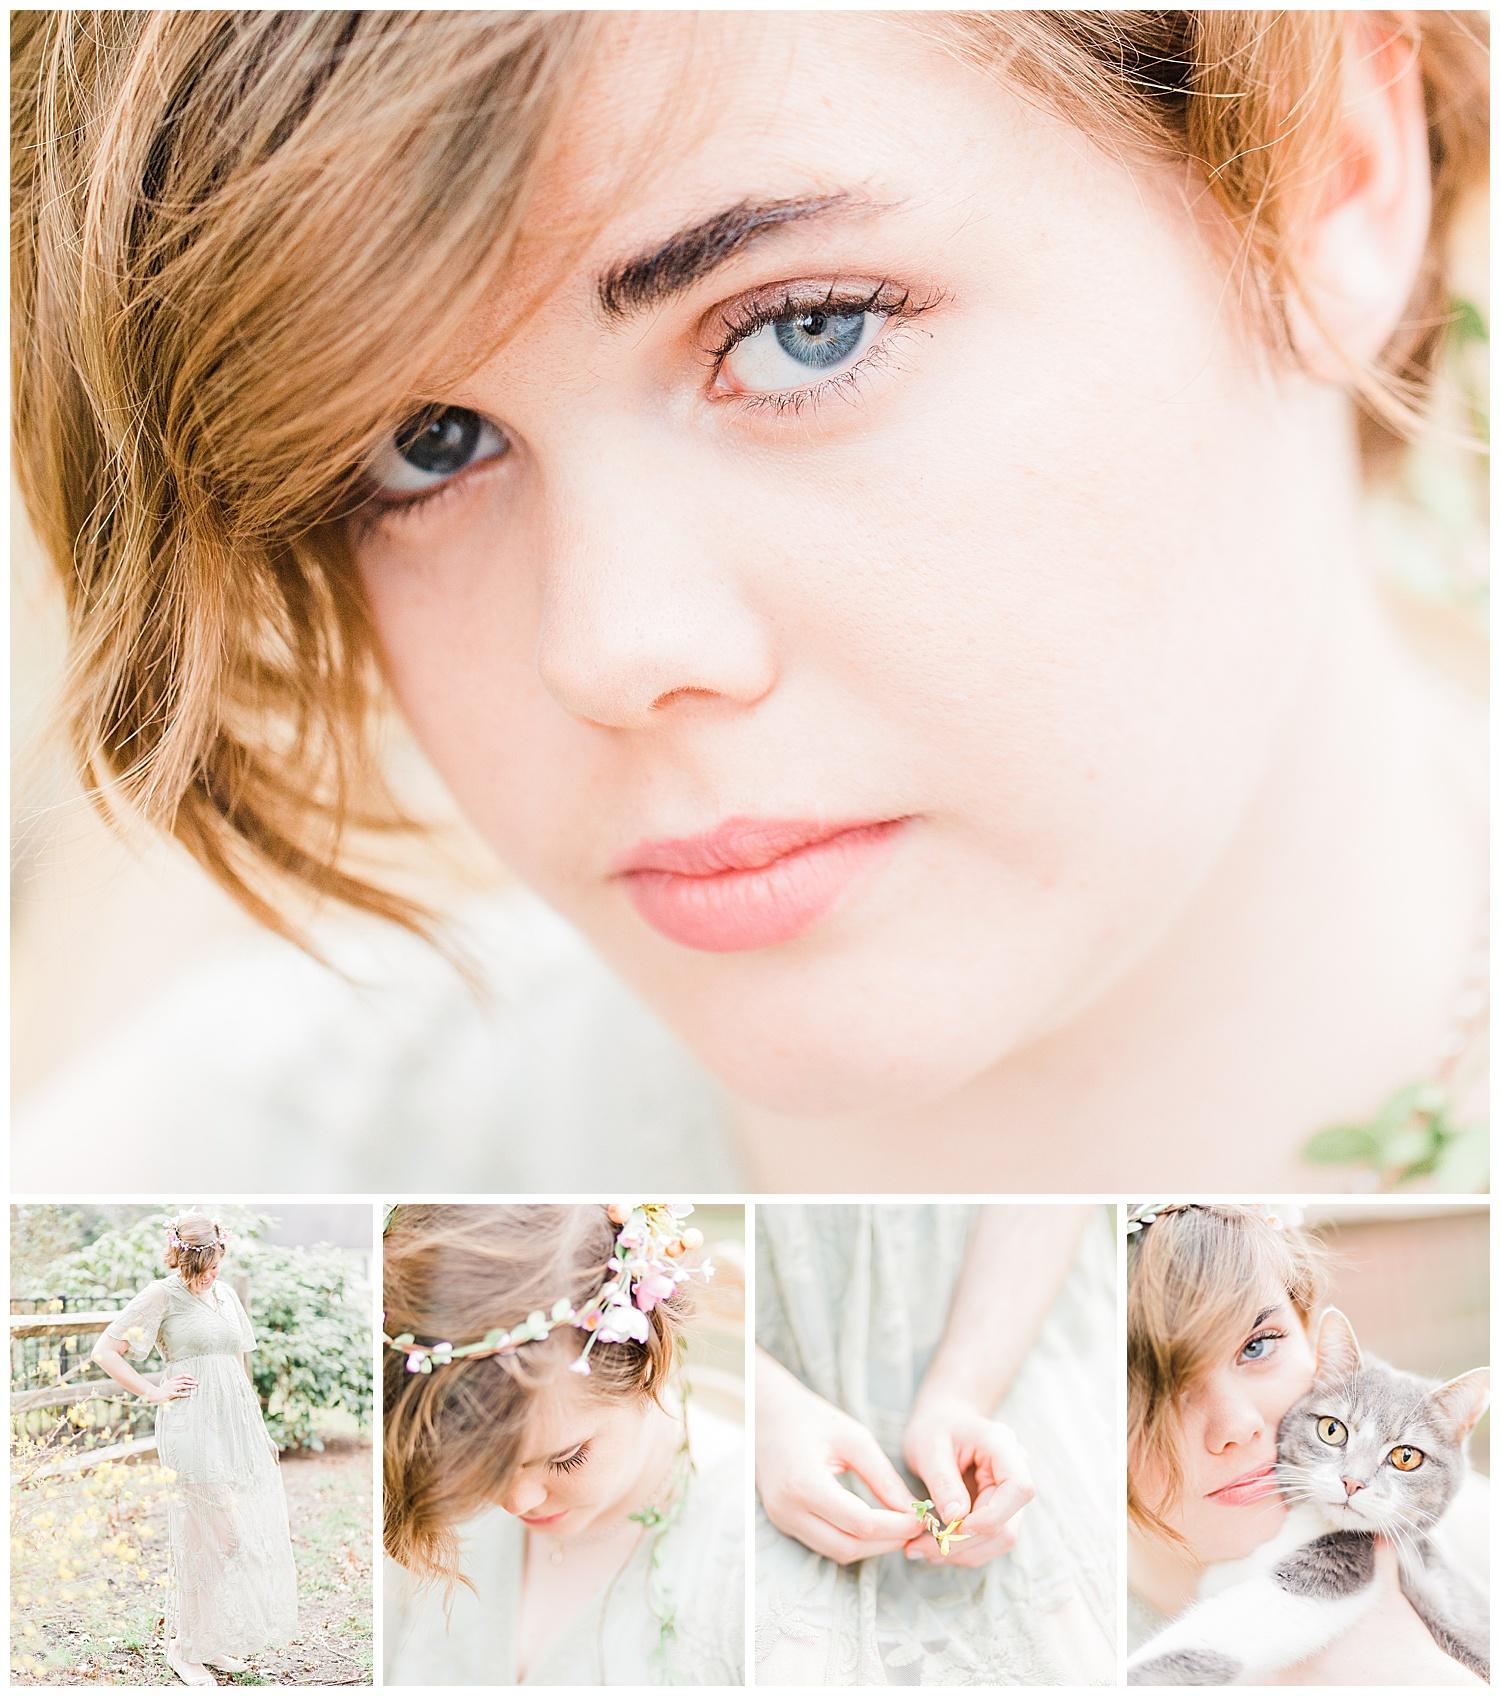 Dreamy Portrait headshot - Virginia family photographer